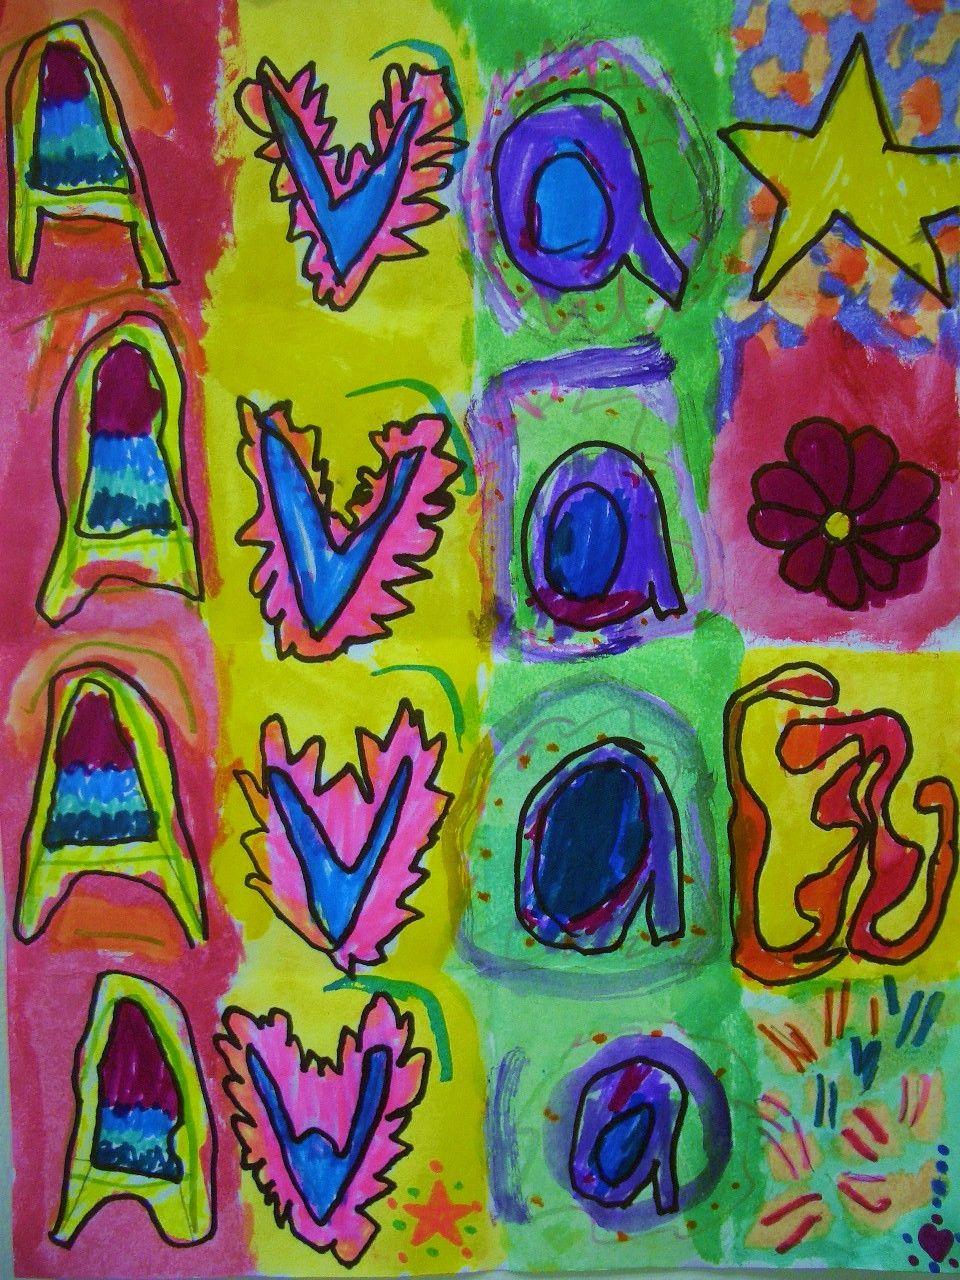 DREAM DRAW CREATE Art Lessons for Children: Name Patterns Inspired ...